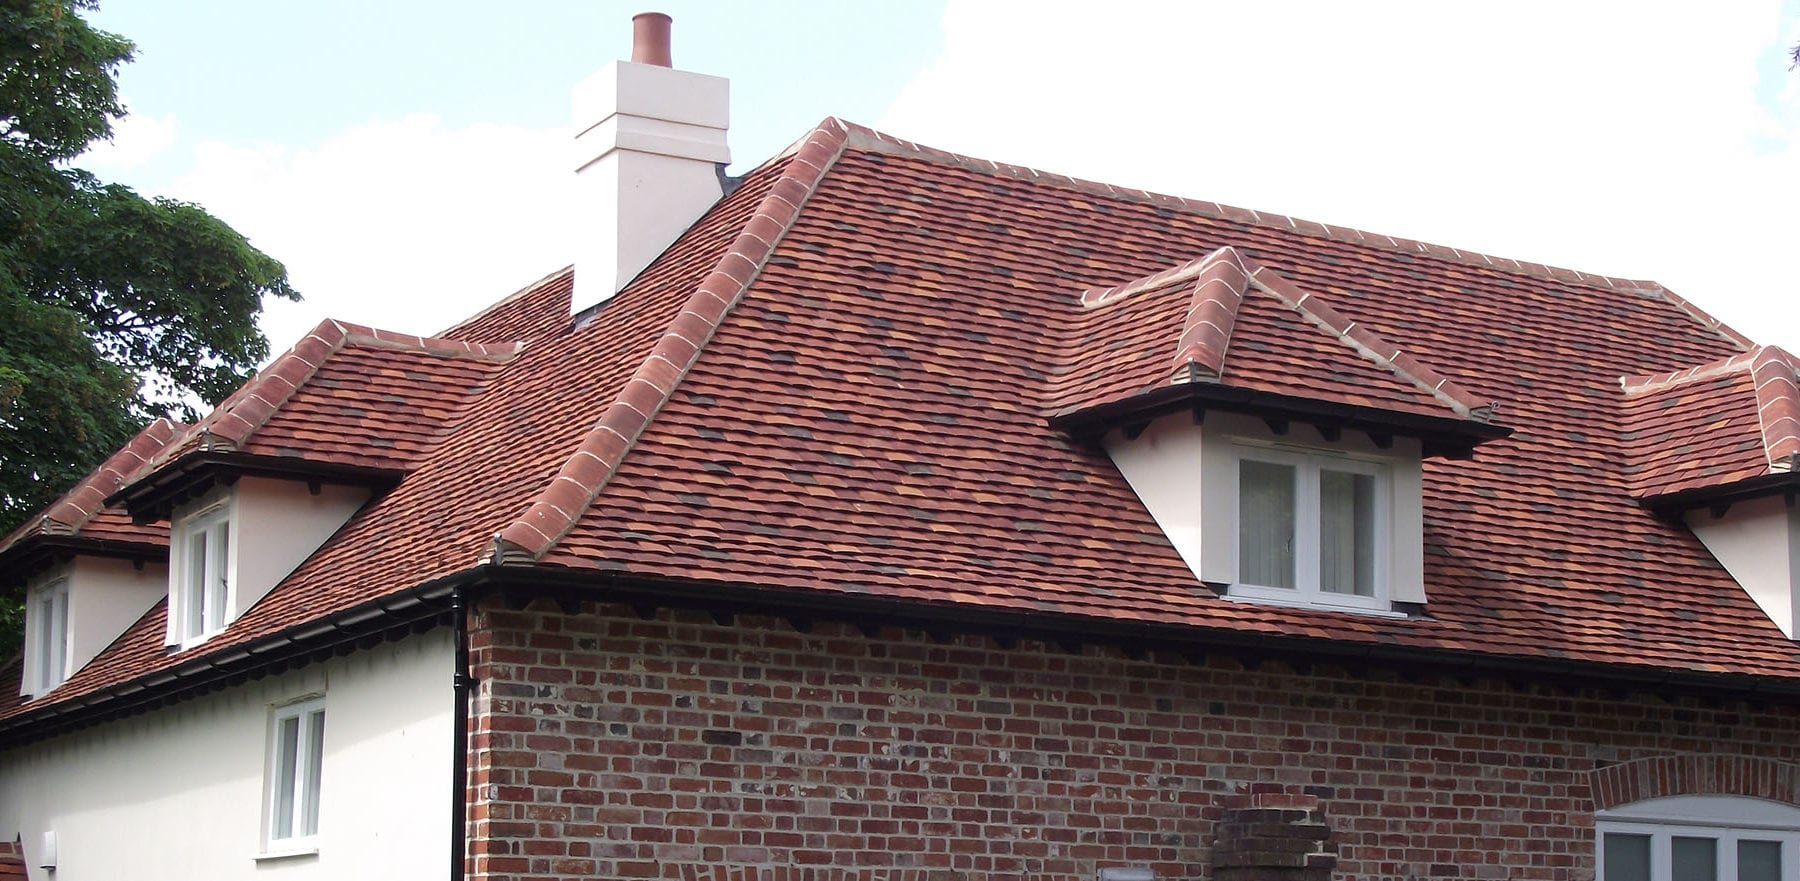 Lifestiles - Handmade Multi Clay Roof Tiles - Stanstead, England 4